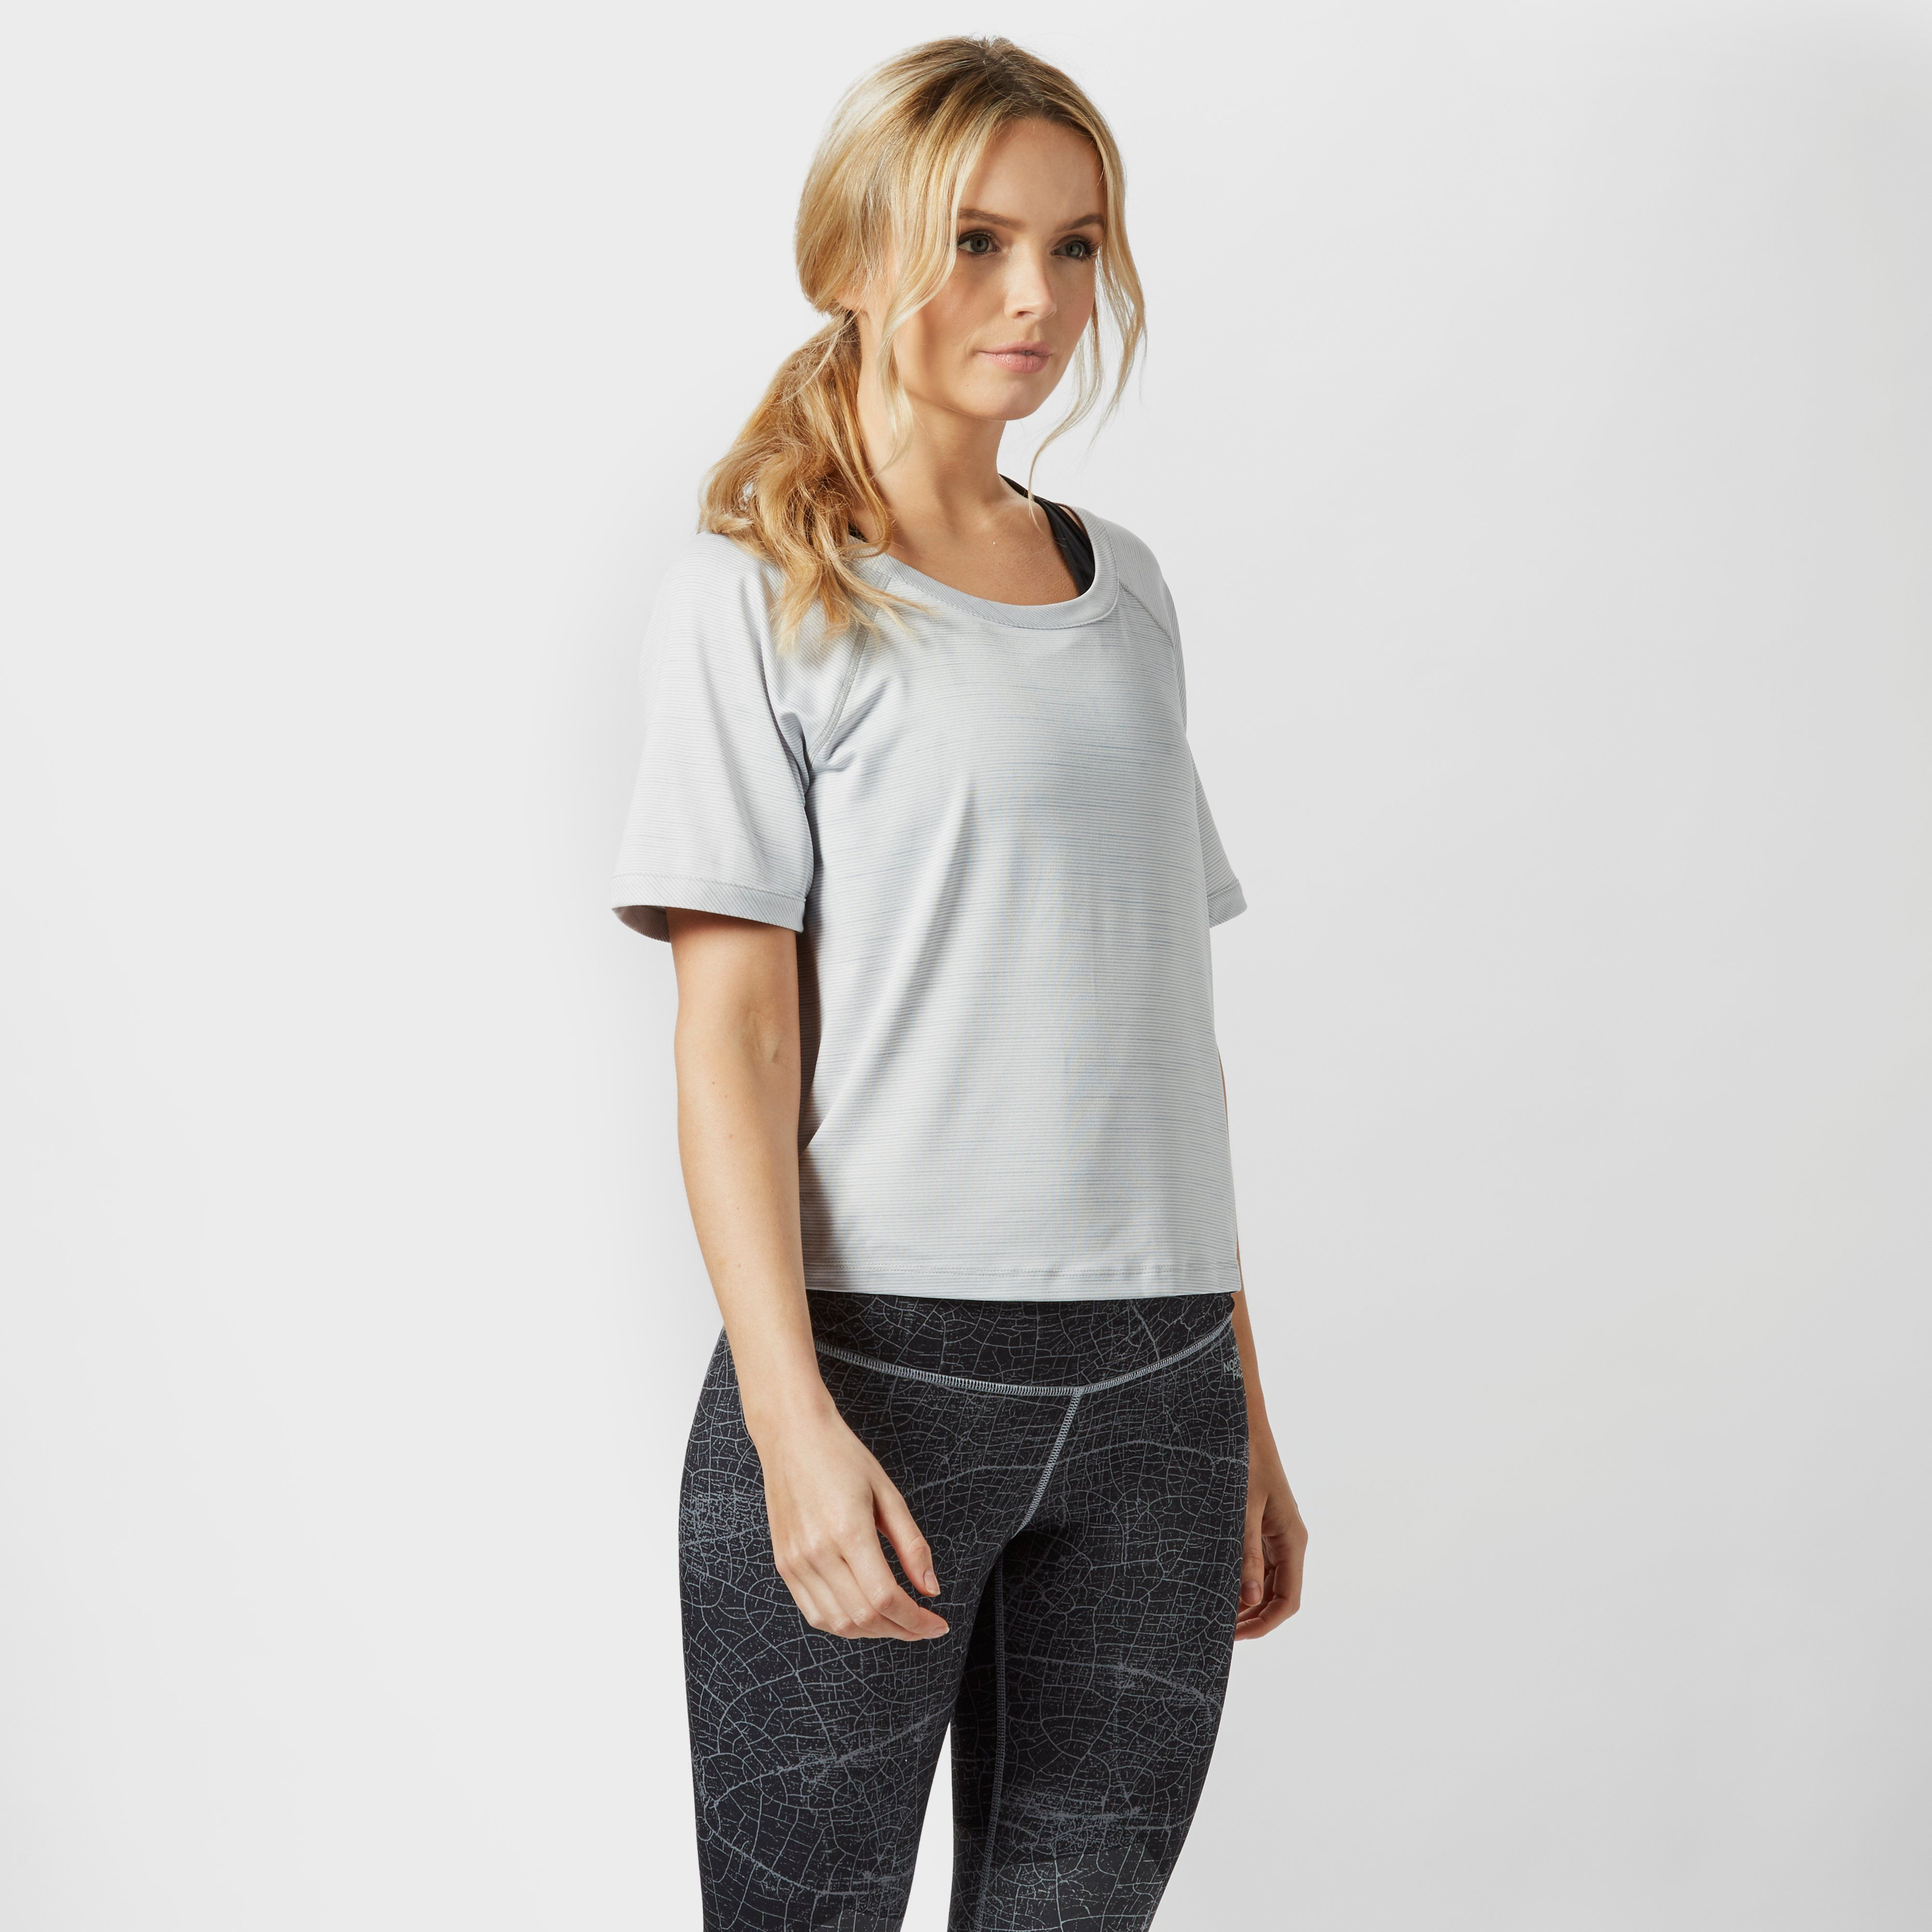 THE NORTH FACE Women's Motivation T-Shirt